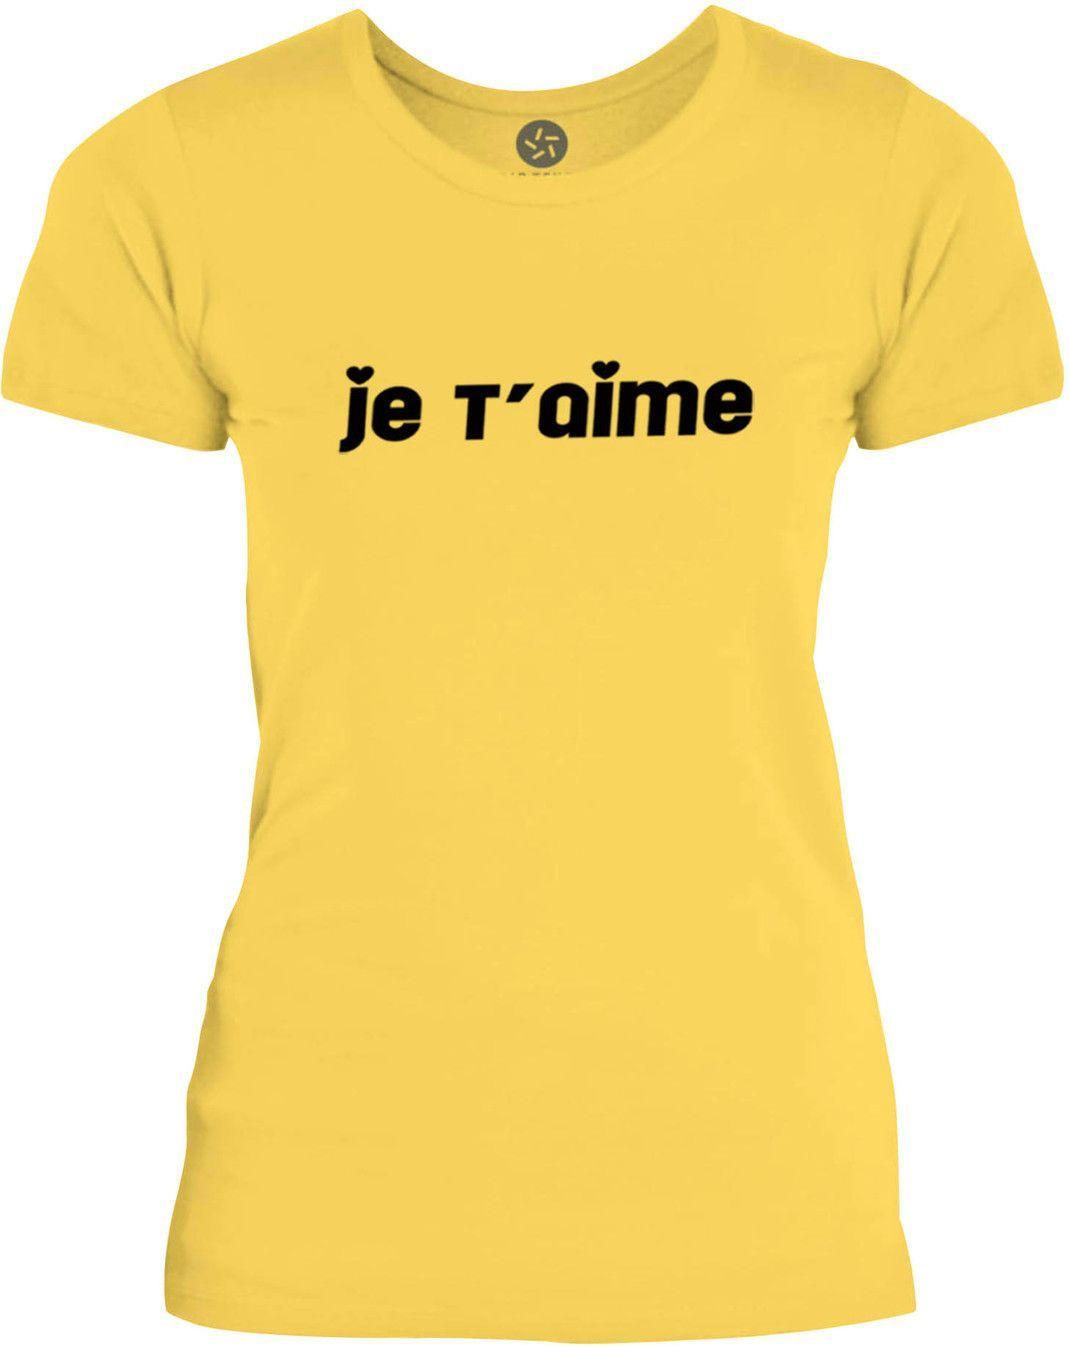 Big Texas Je Taime (Black) Womens Fine Jersey T-Shirt